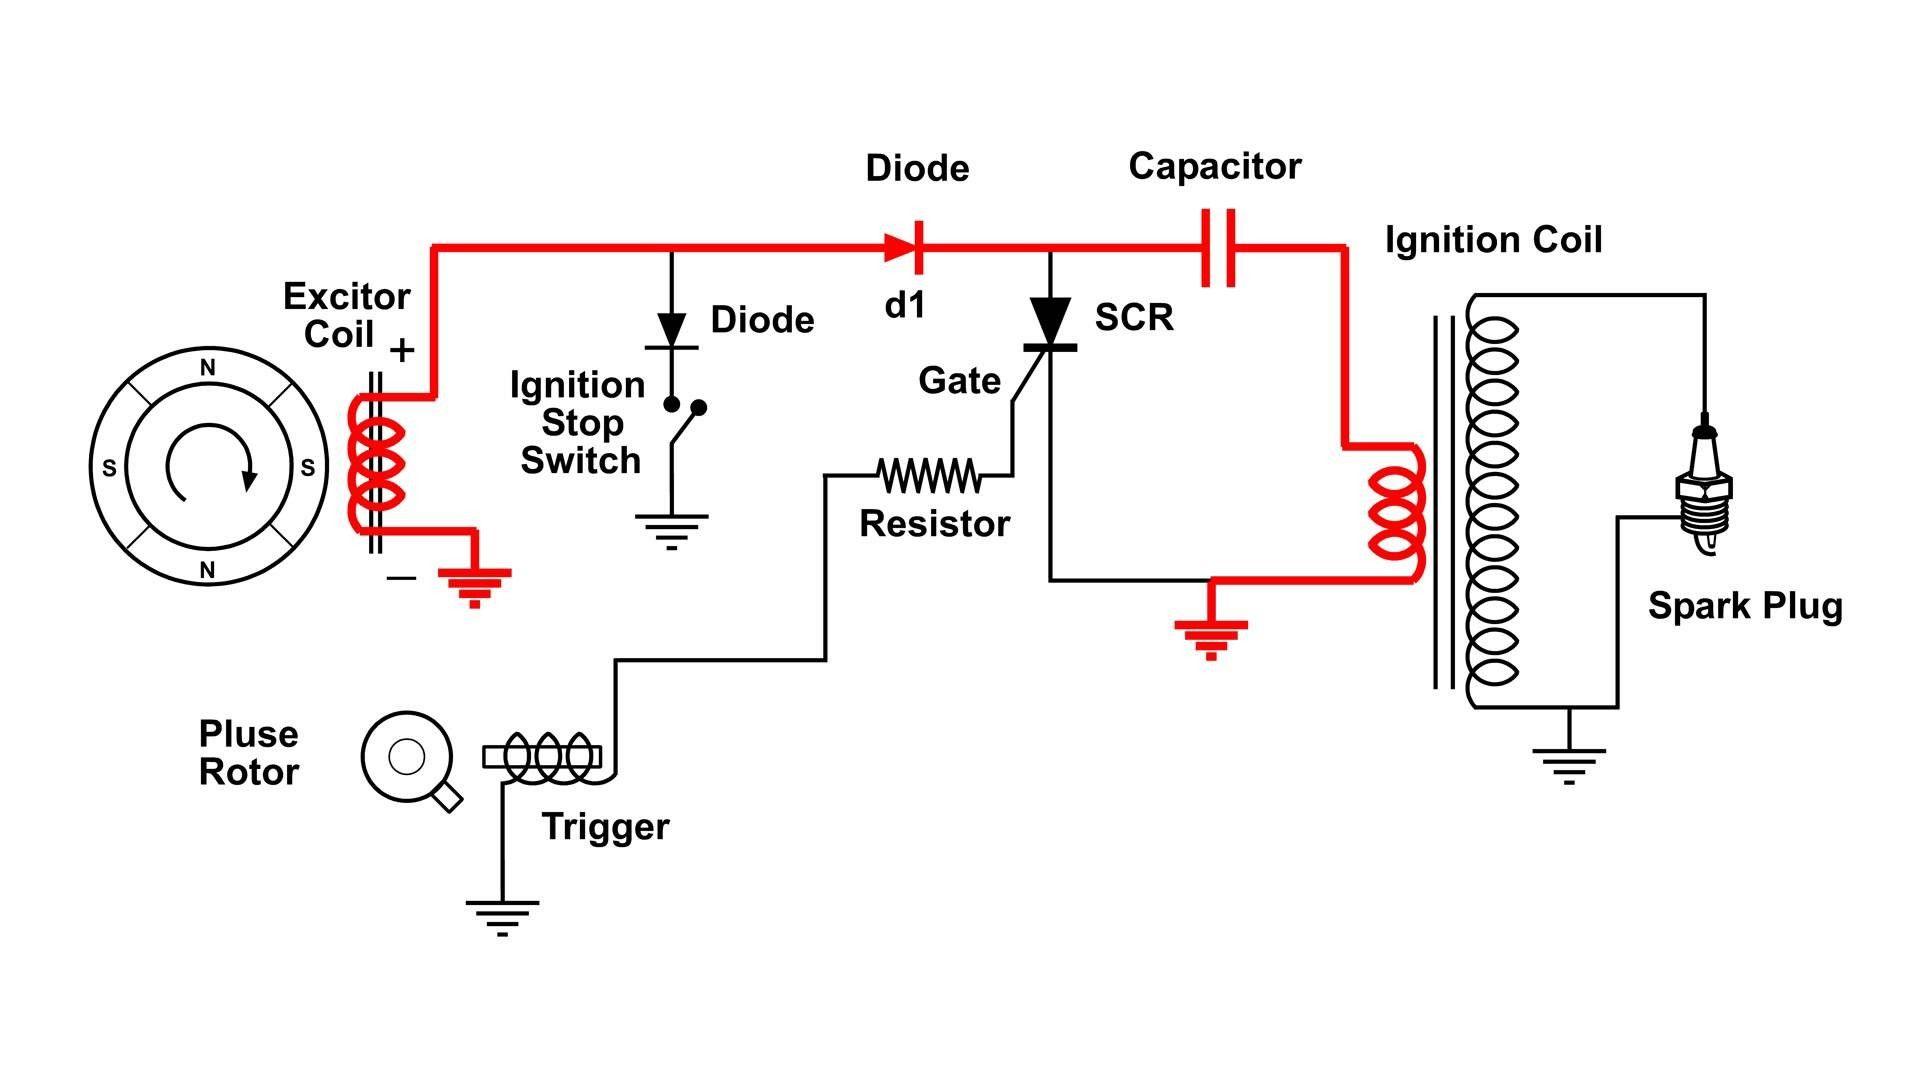 hight resolution of magneto cdi wiring diagram wiring diagram name magneto cdi wiring diagram